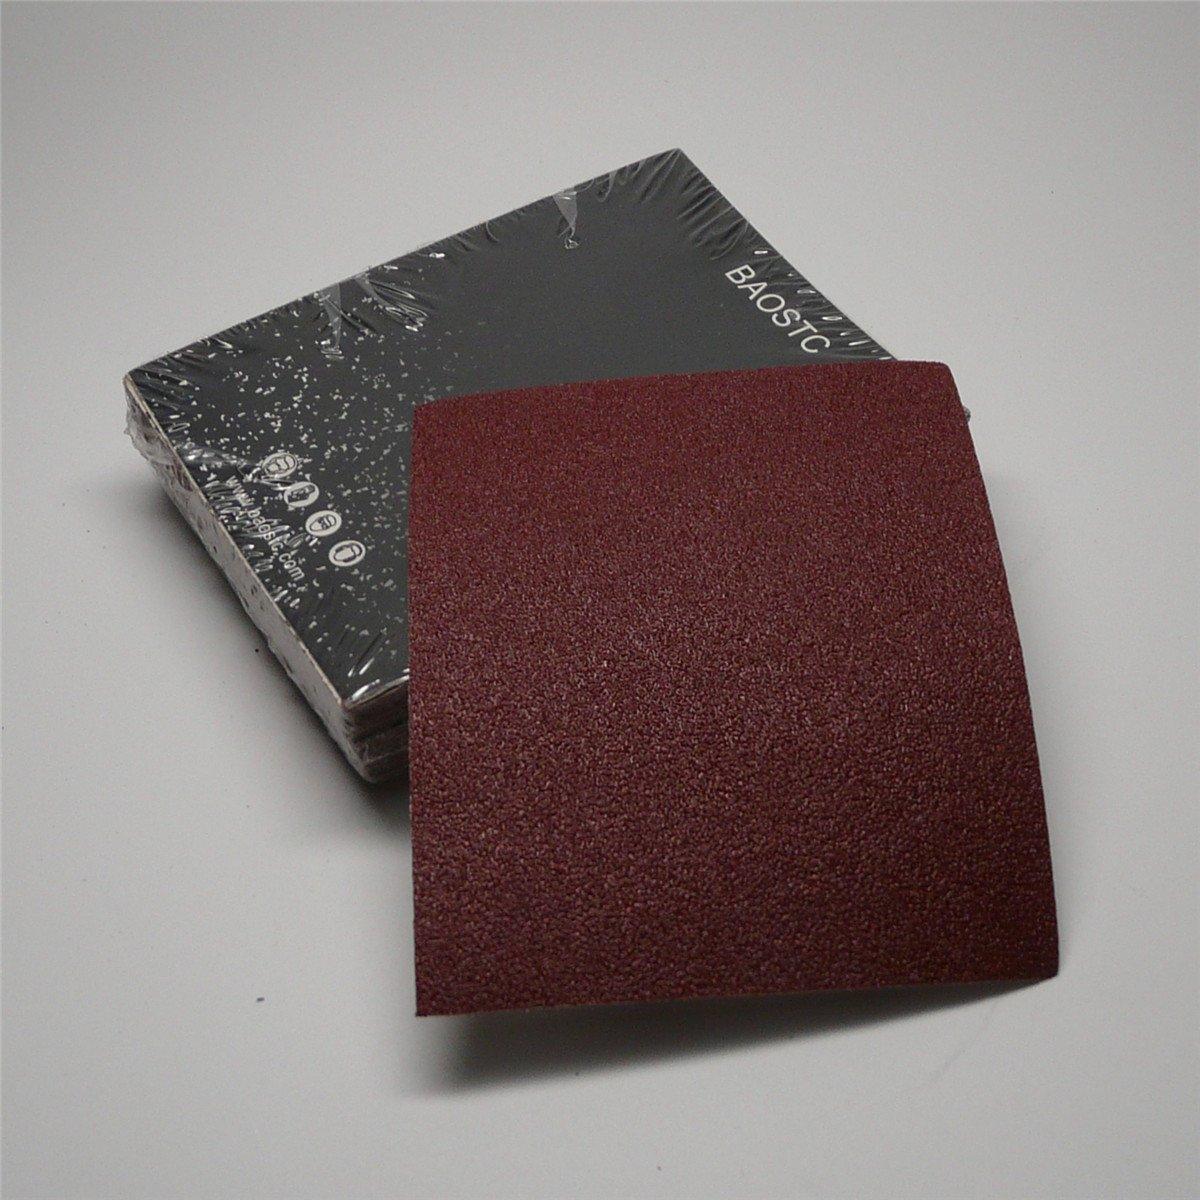 BAOSTC 1/4 sandpaper sheet,4-1/2''*5-1/2'' Assorted 60-80-120-180-240,50PACK by BAOSTC